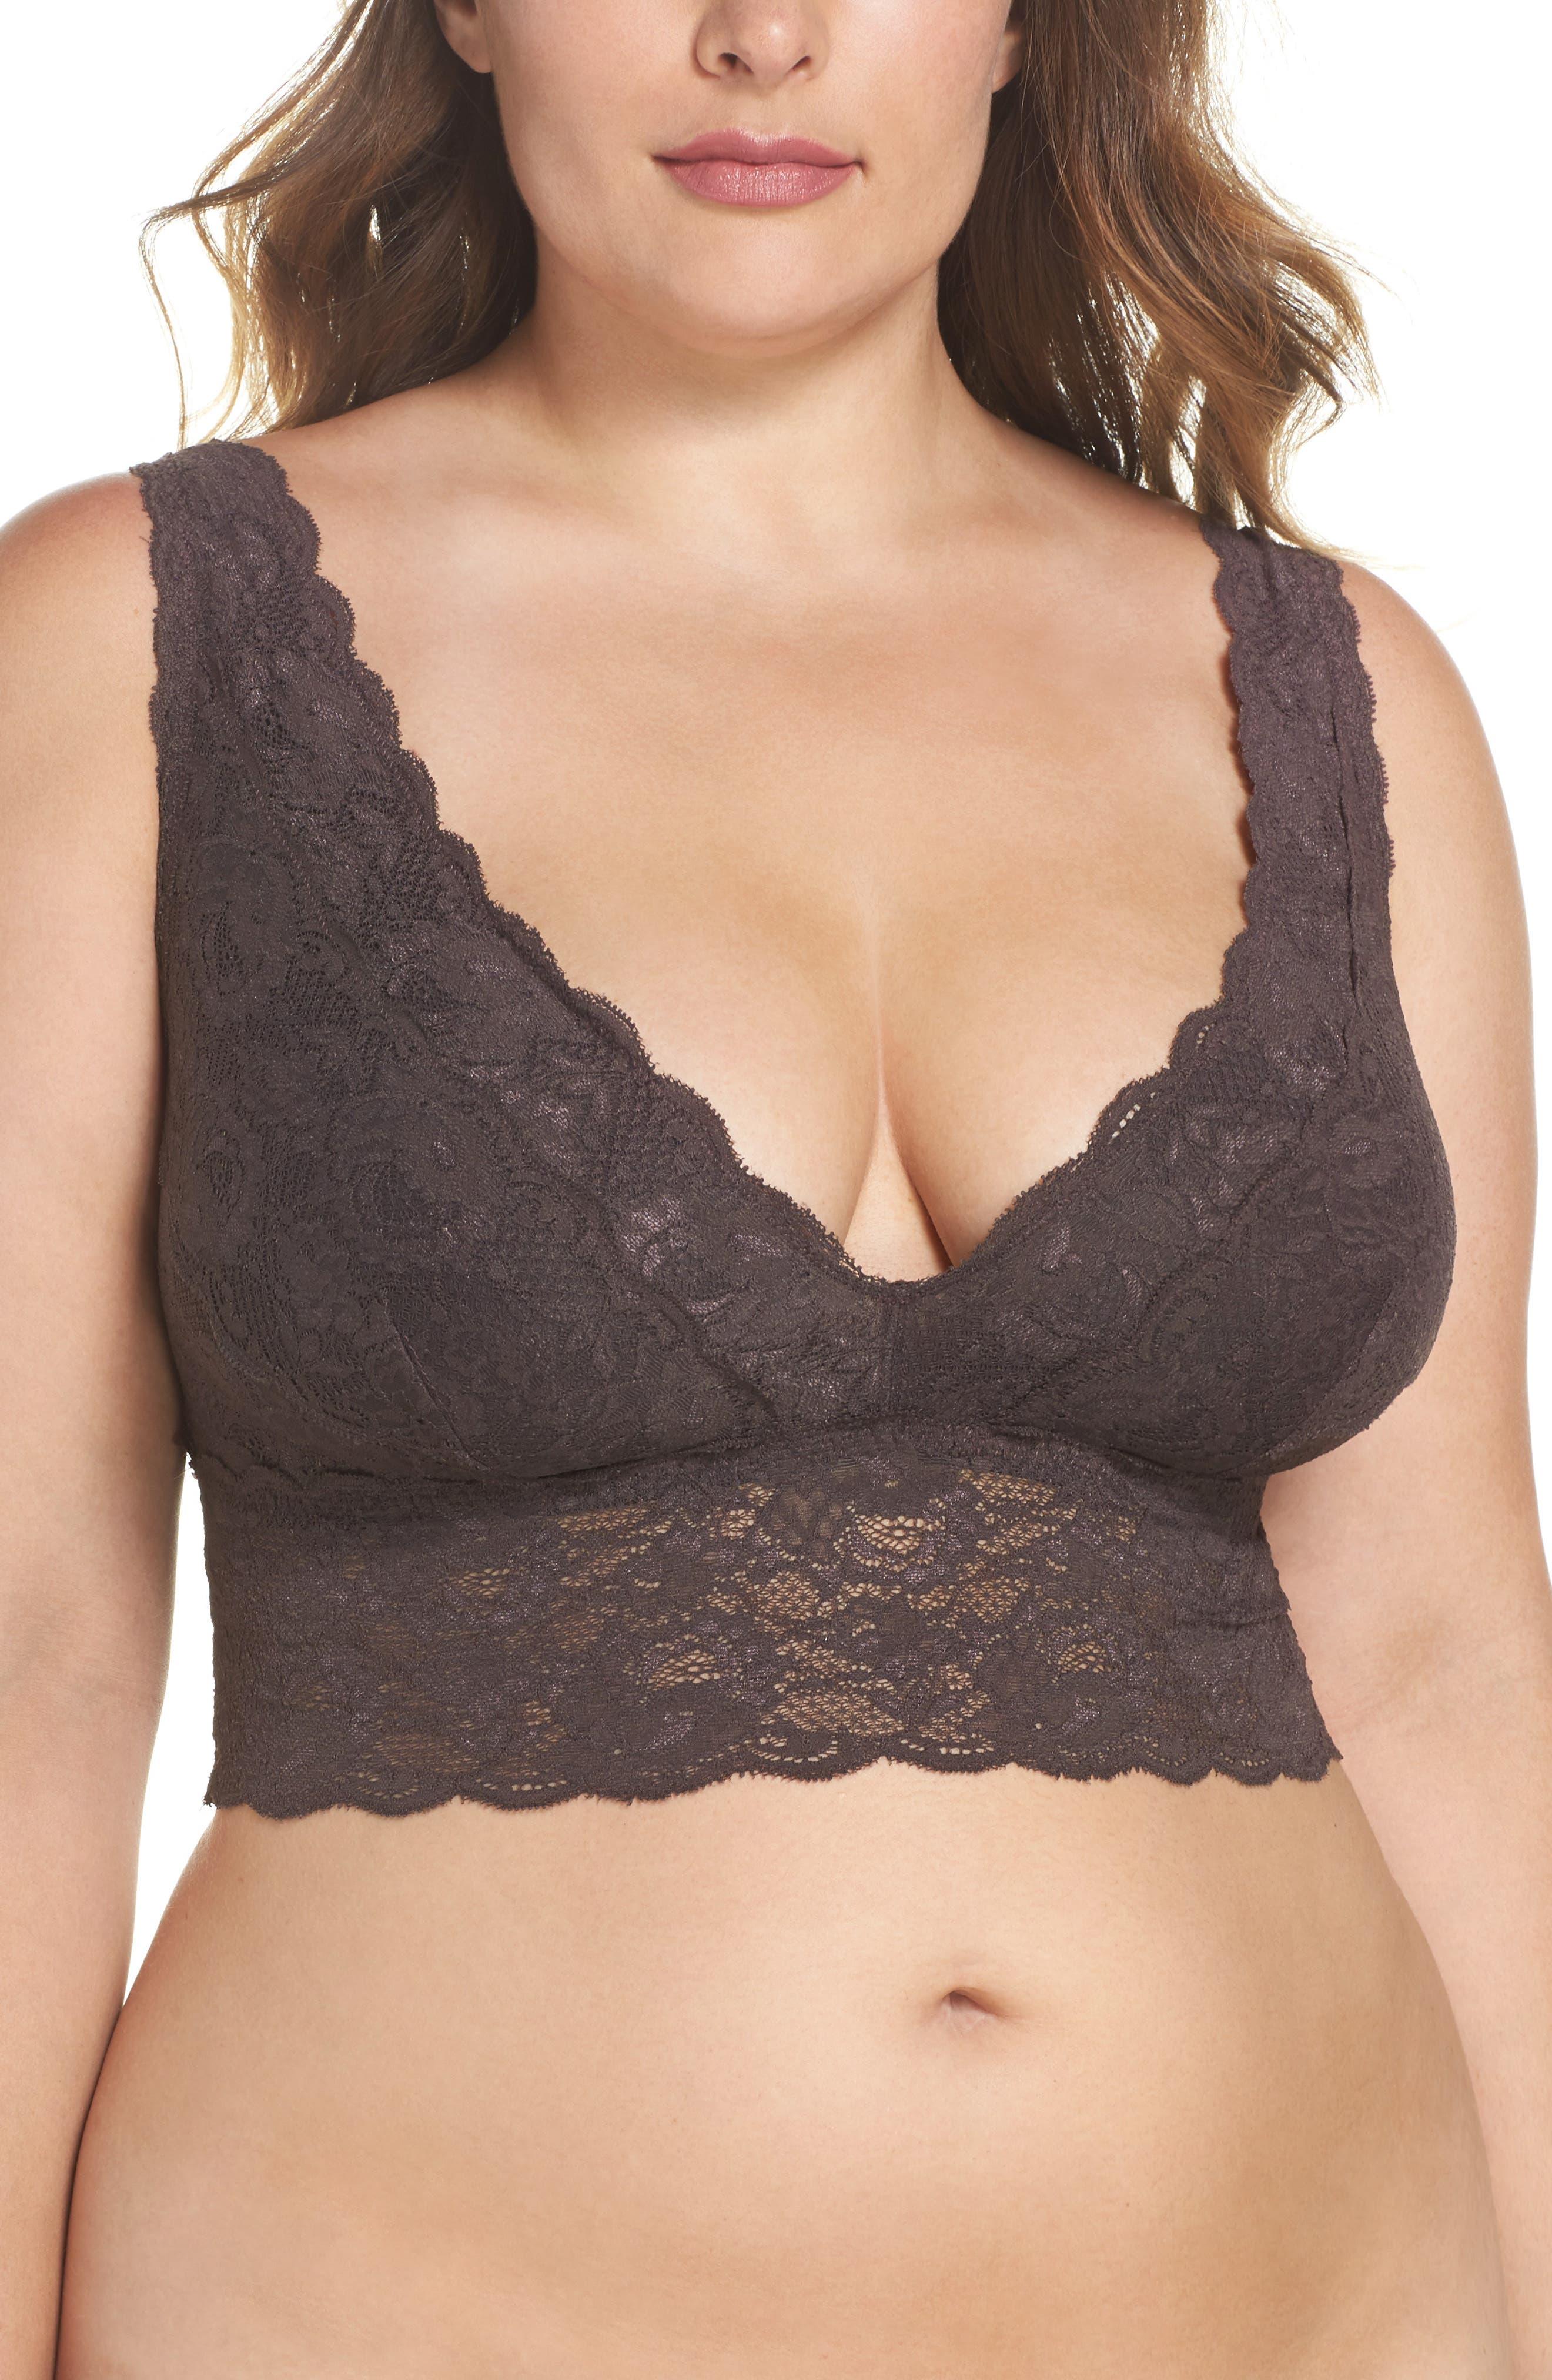 Main Image - Cosabella Never Say Never Plungie Lace Longline Bralette (Plus Size)